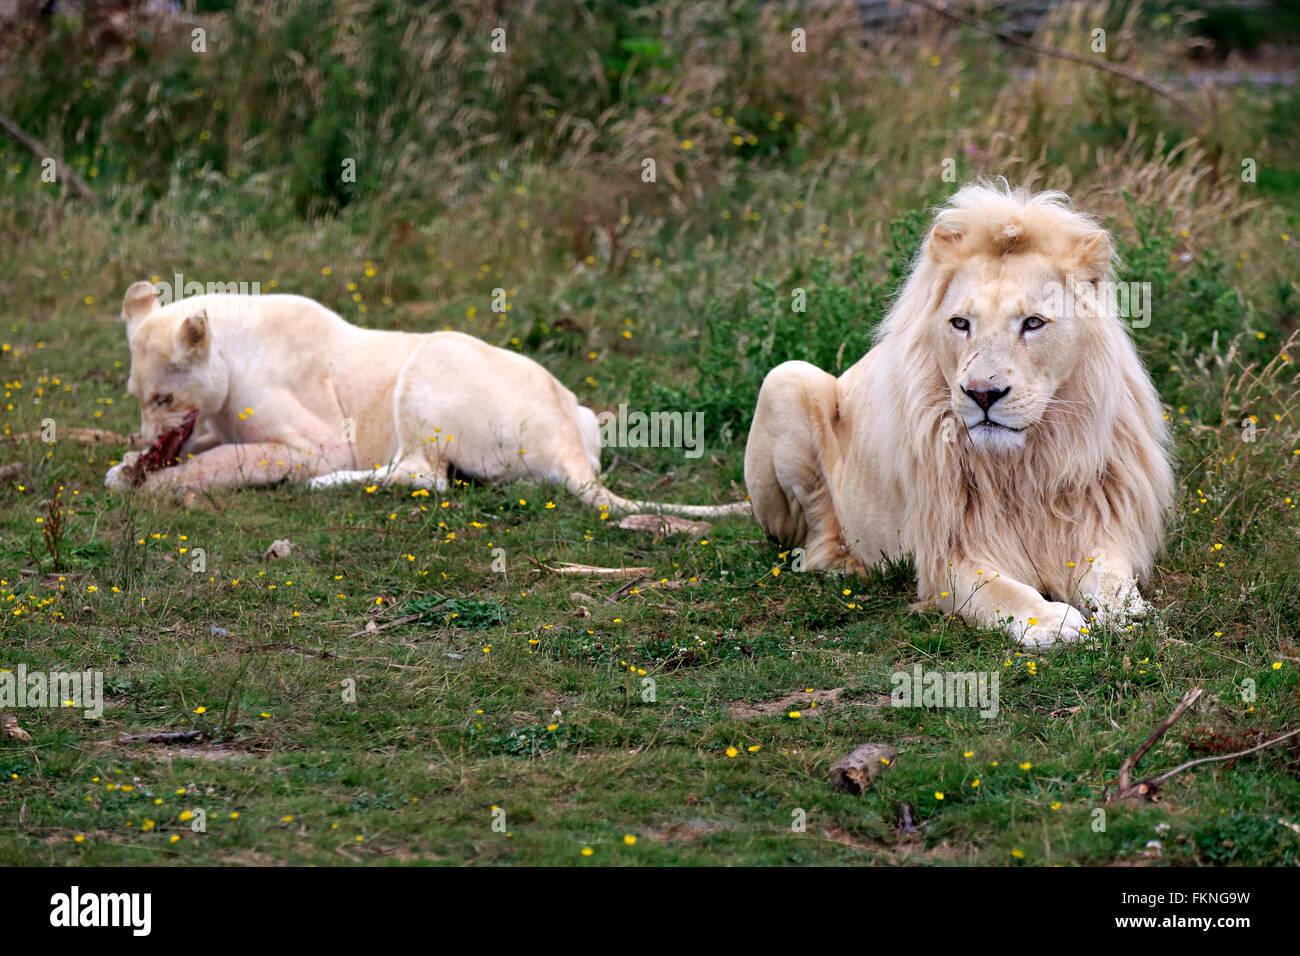 Lion, White Form, Africa / (Panthera leo) Stock Photo